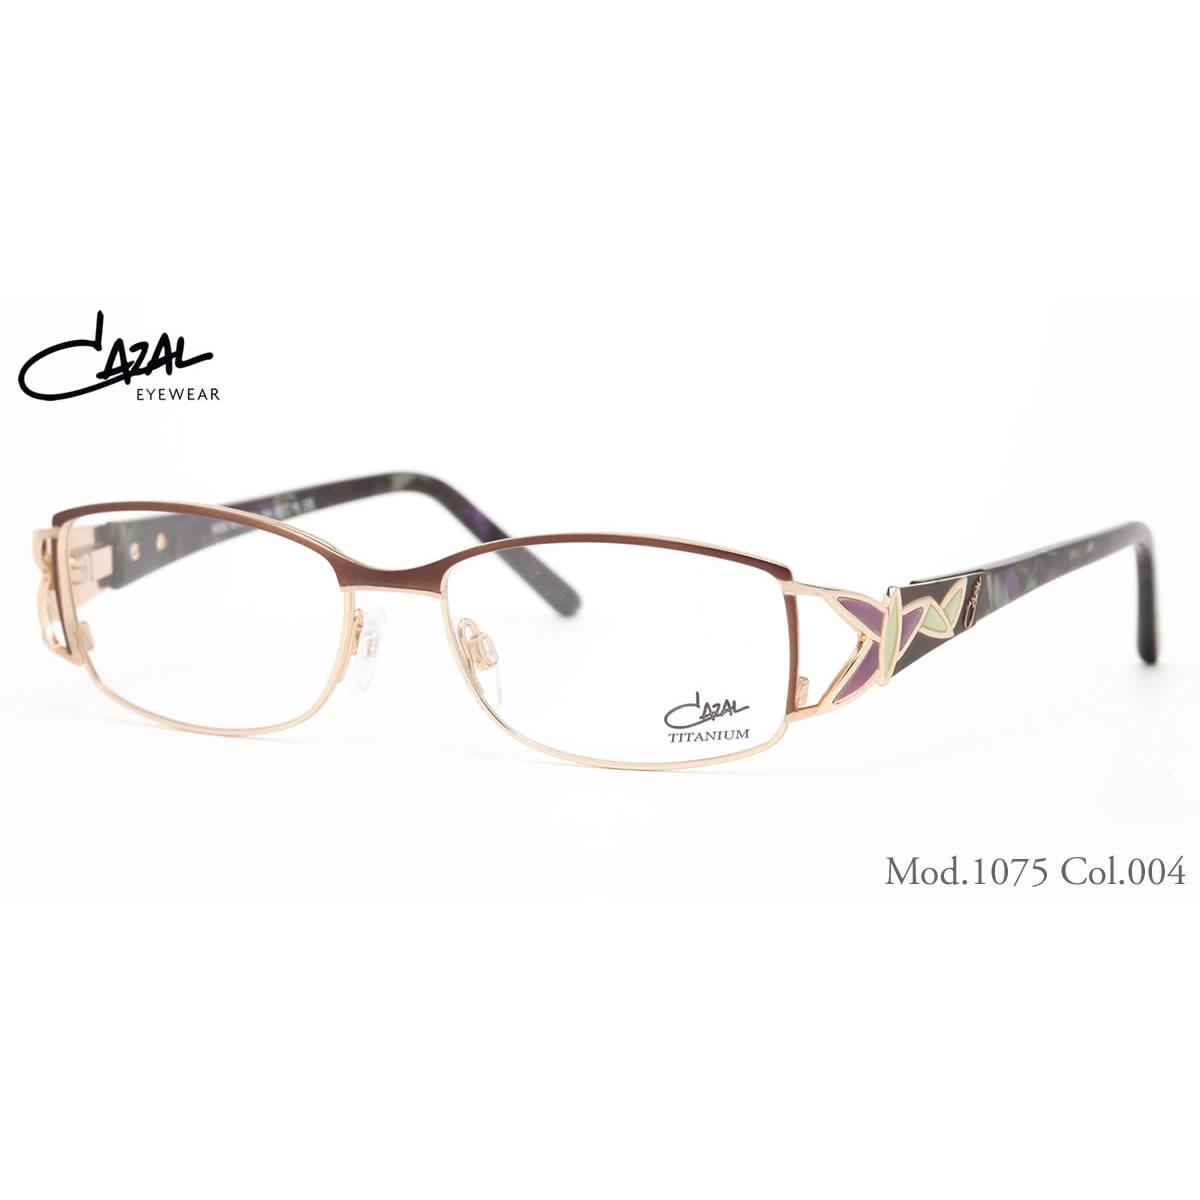 Optical Shop Thats | Rakuten Global Market: CAZAL eyeglass frames ...